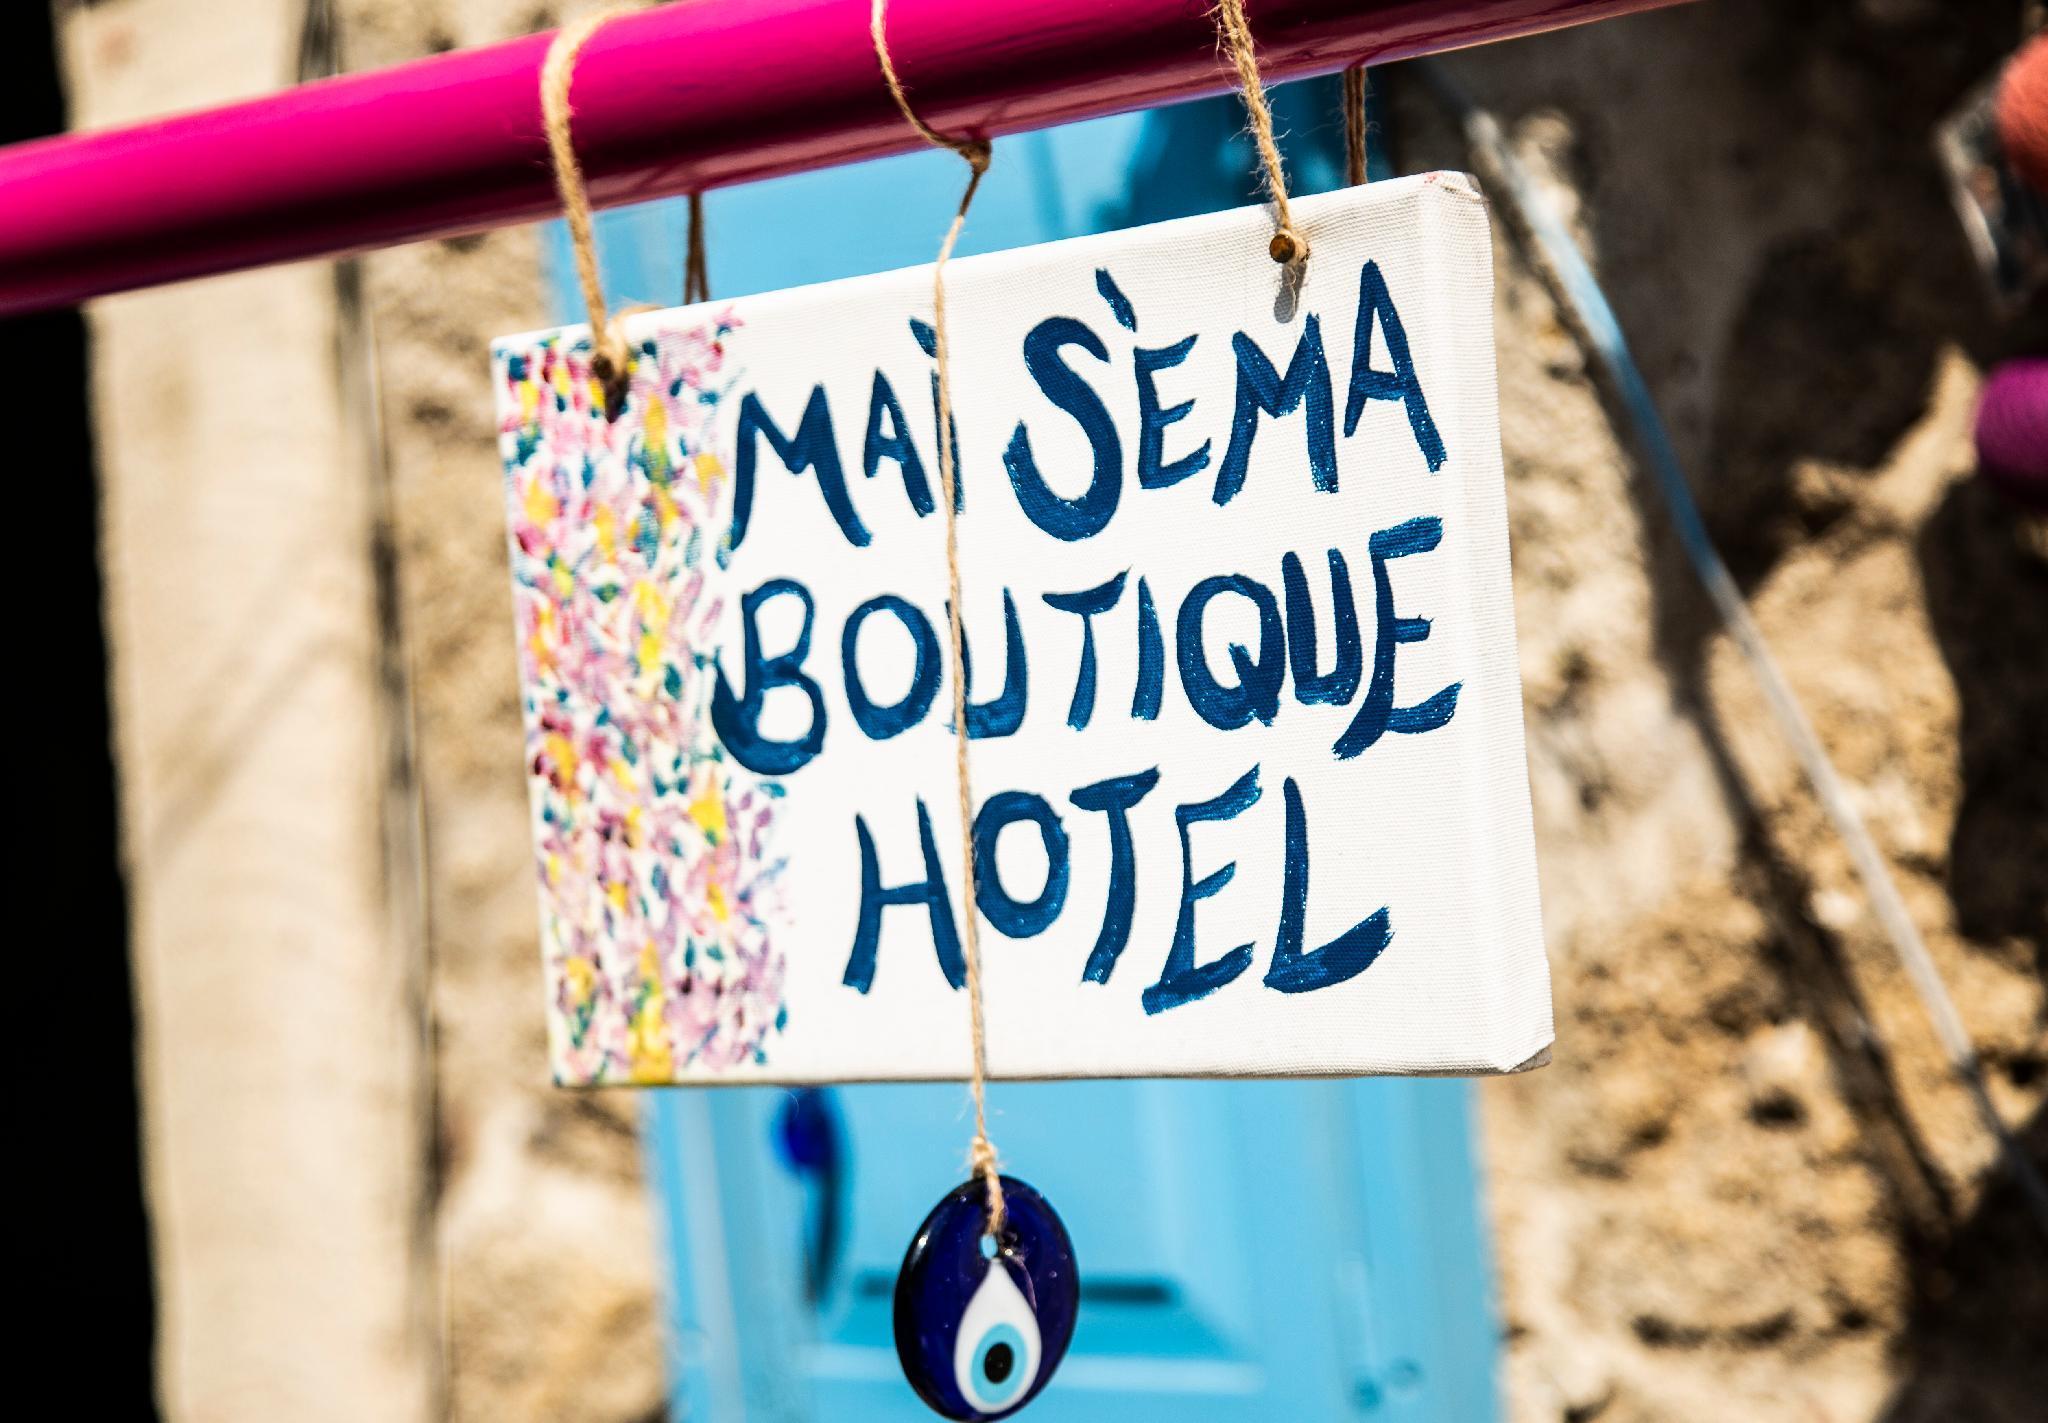 Mai Sema Boutique Hotel